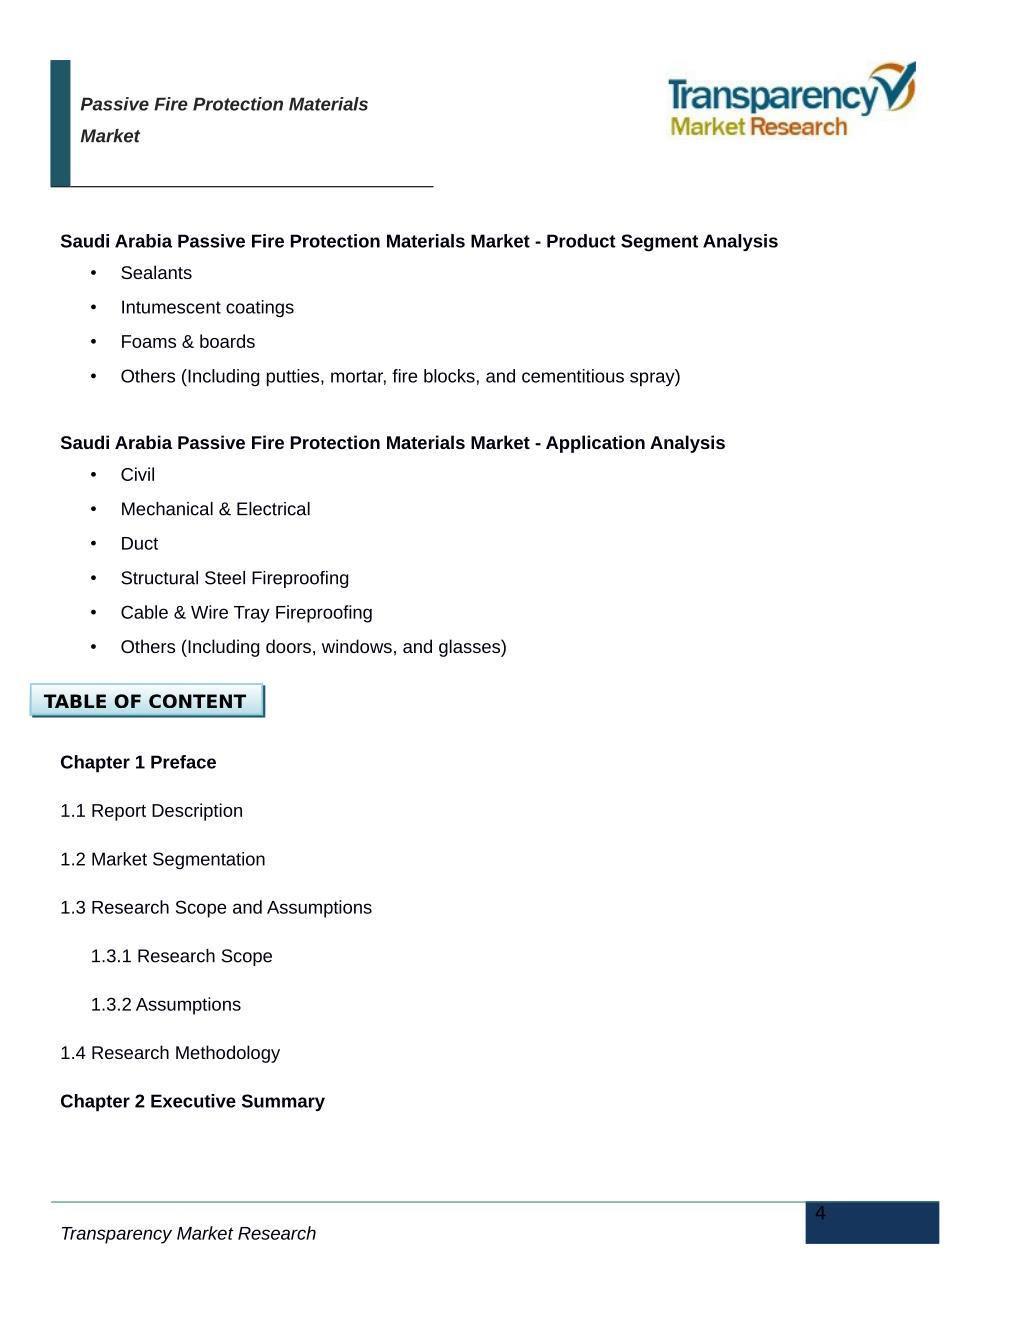 PPT - Passive Fire Protection Materials - Saudi Arabia